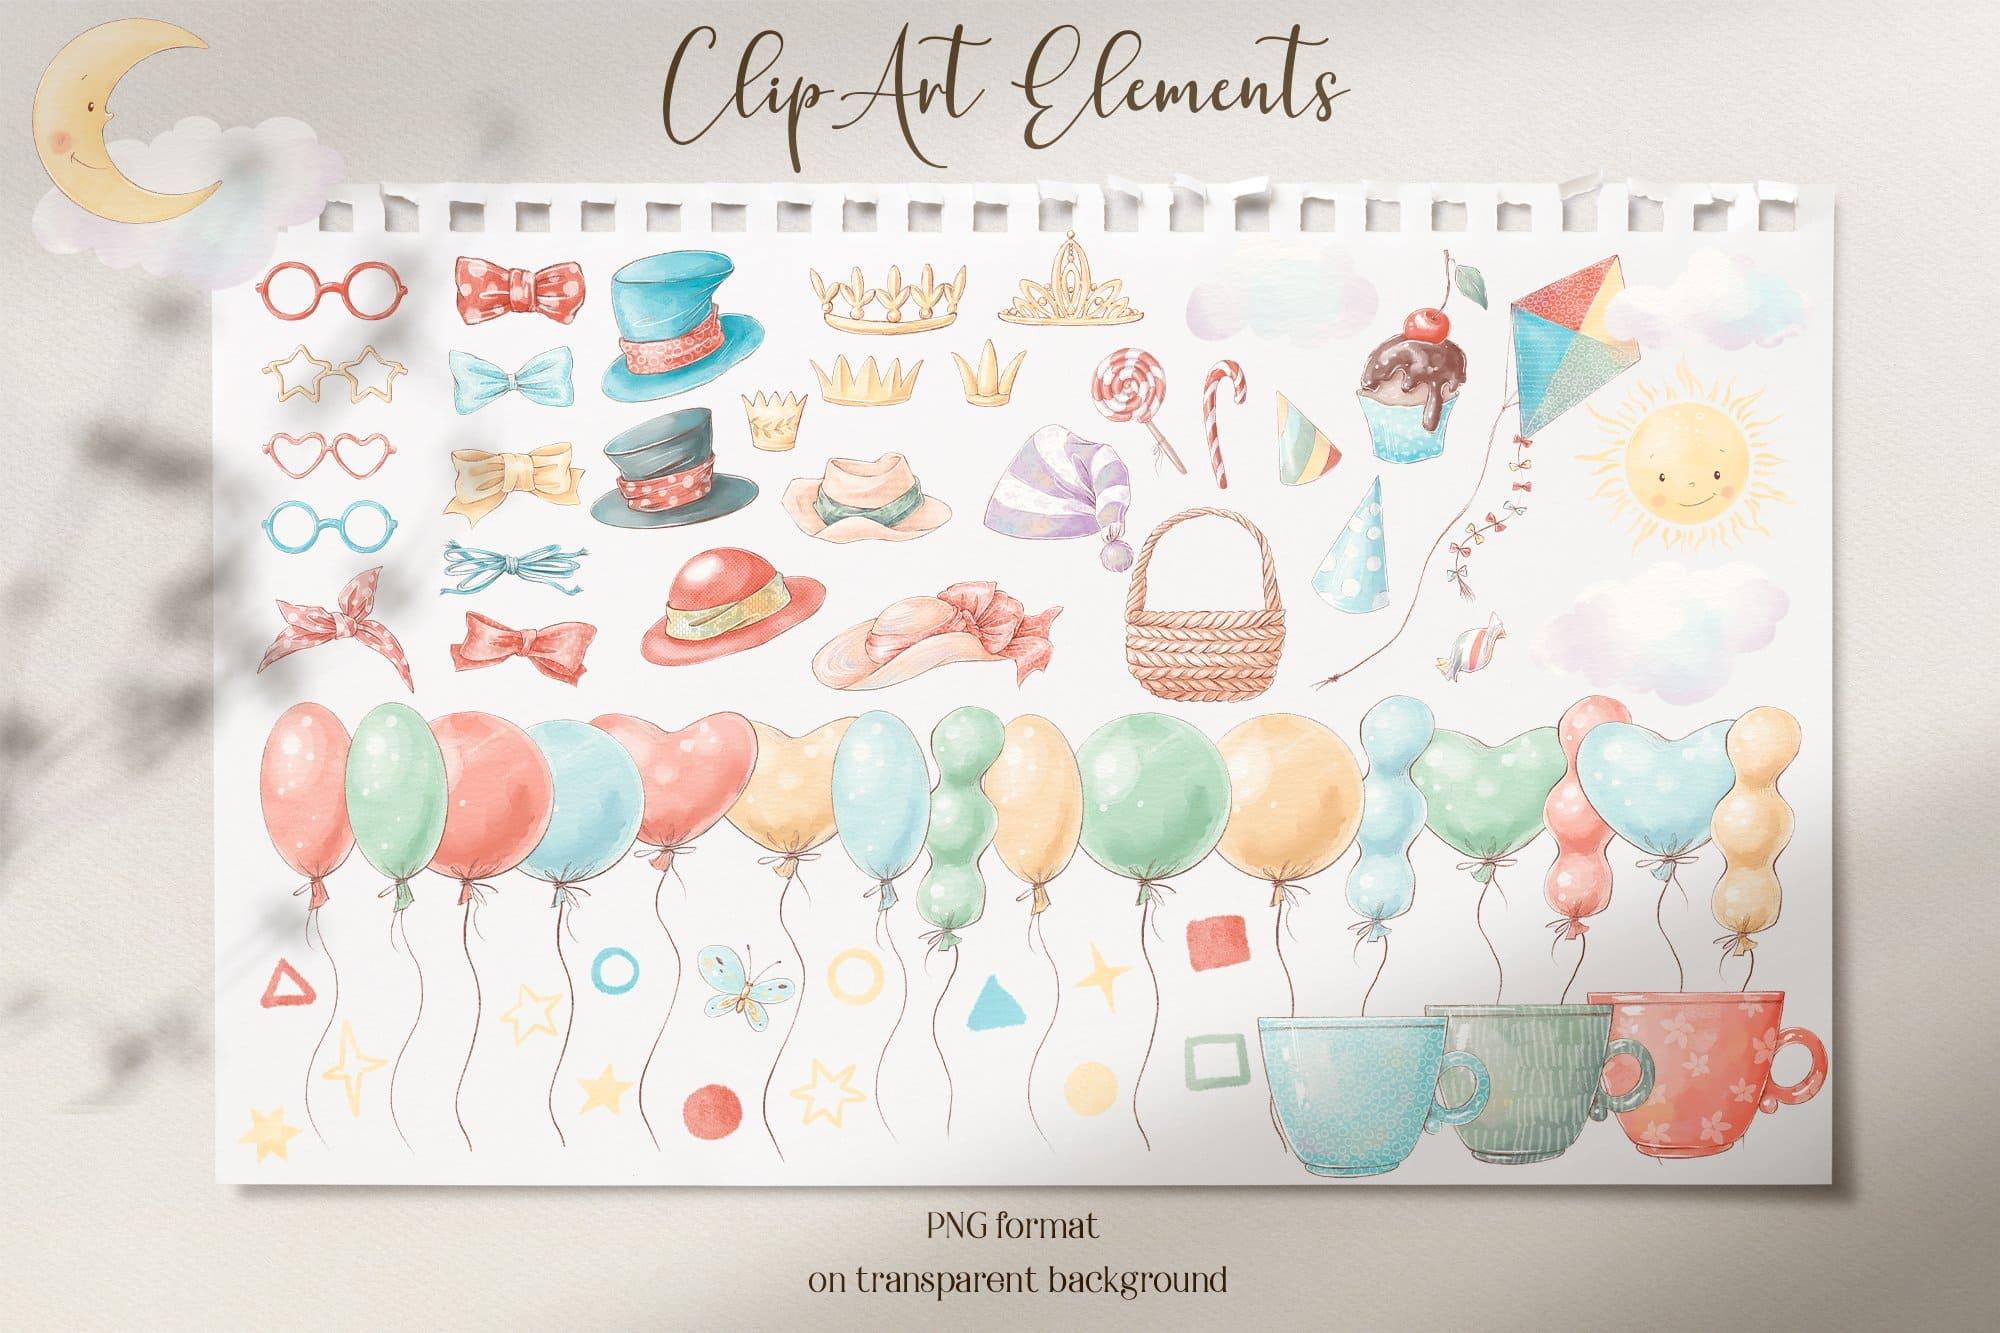 Elements for clip art.